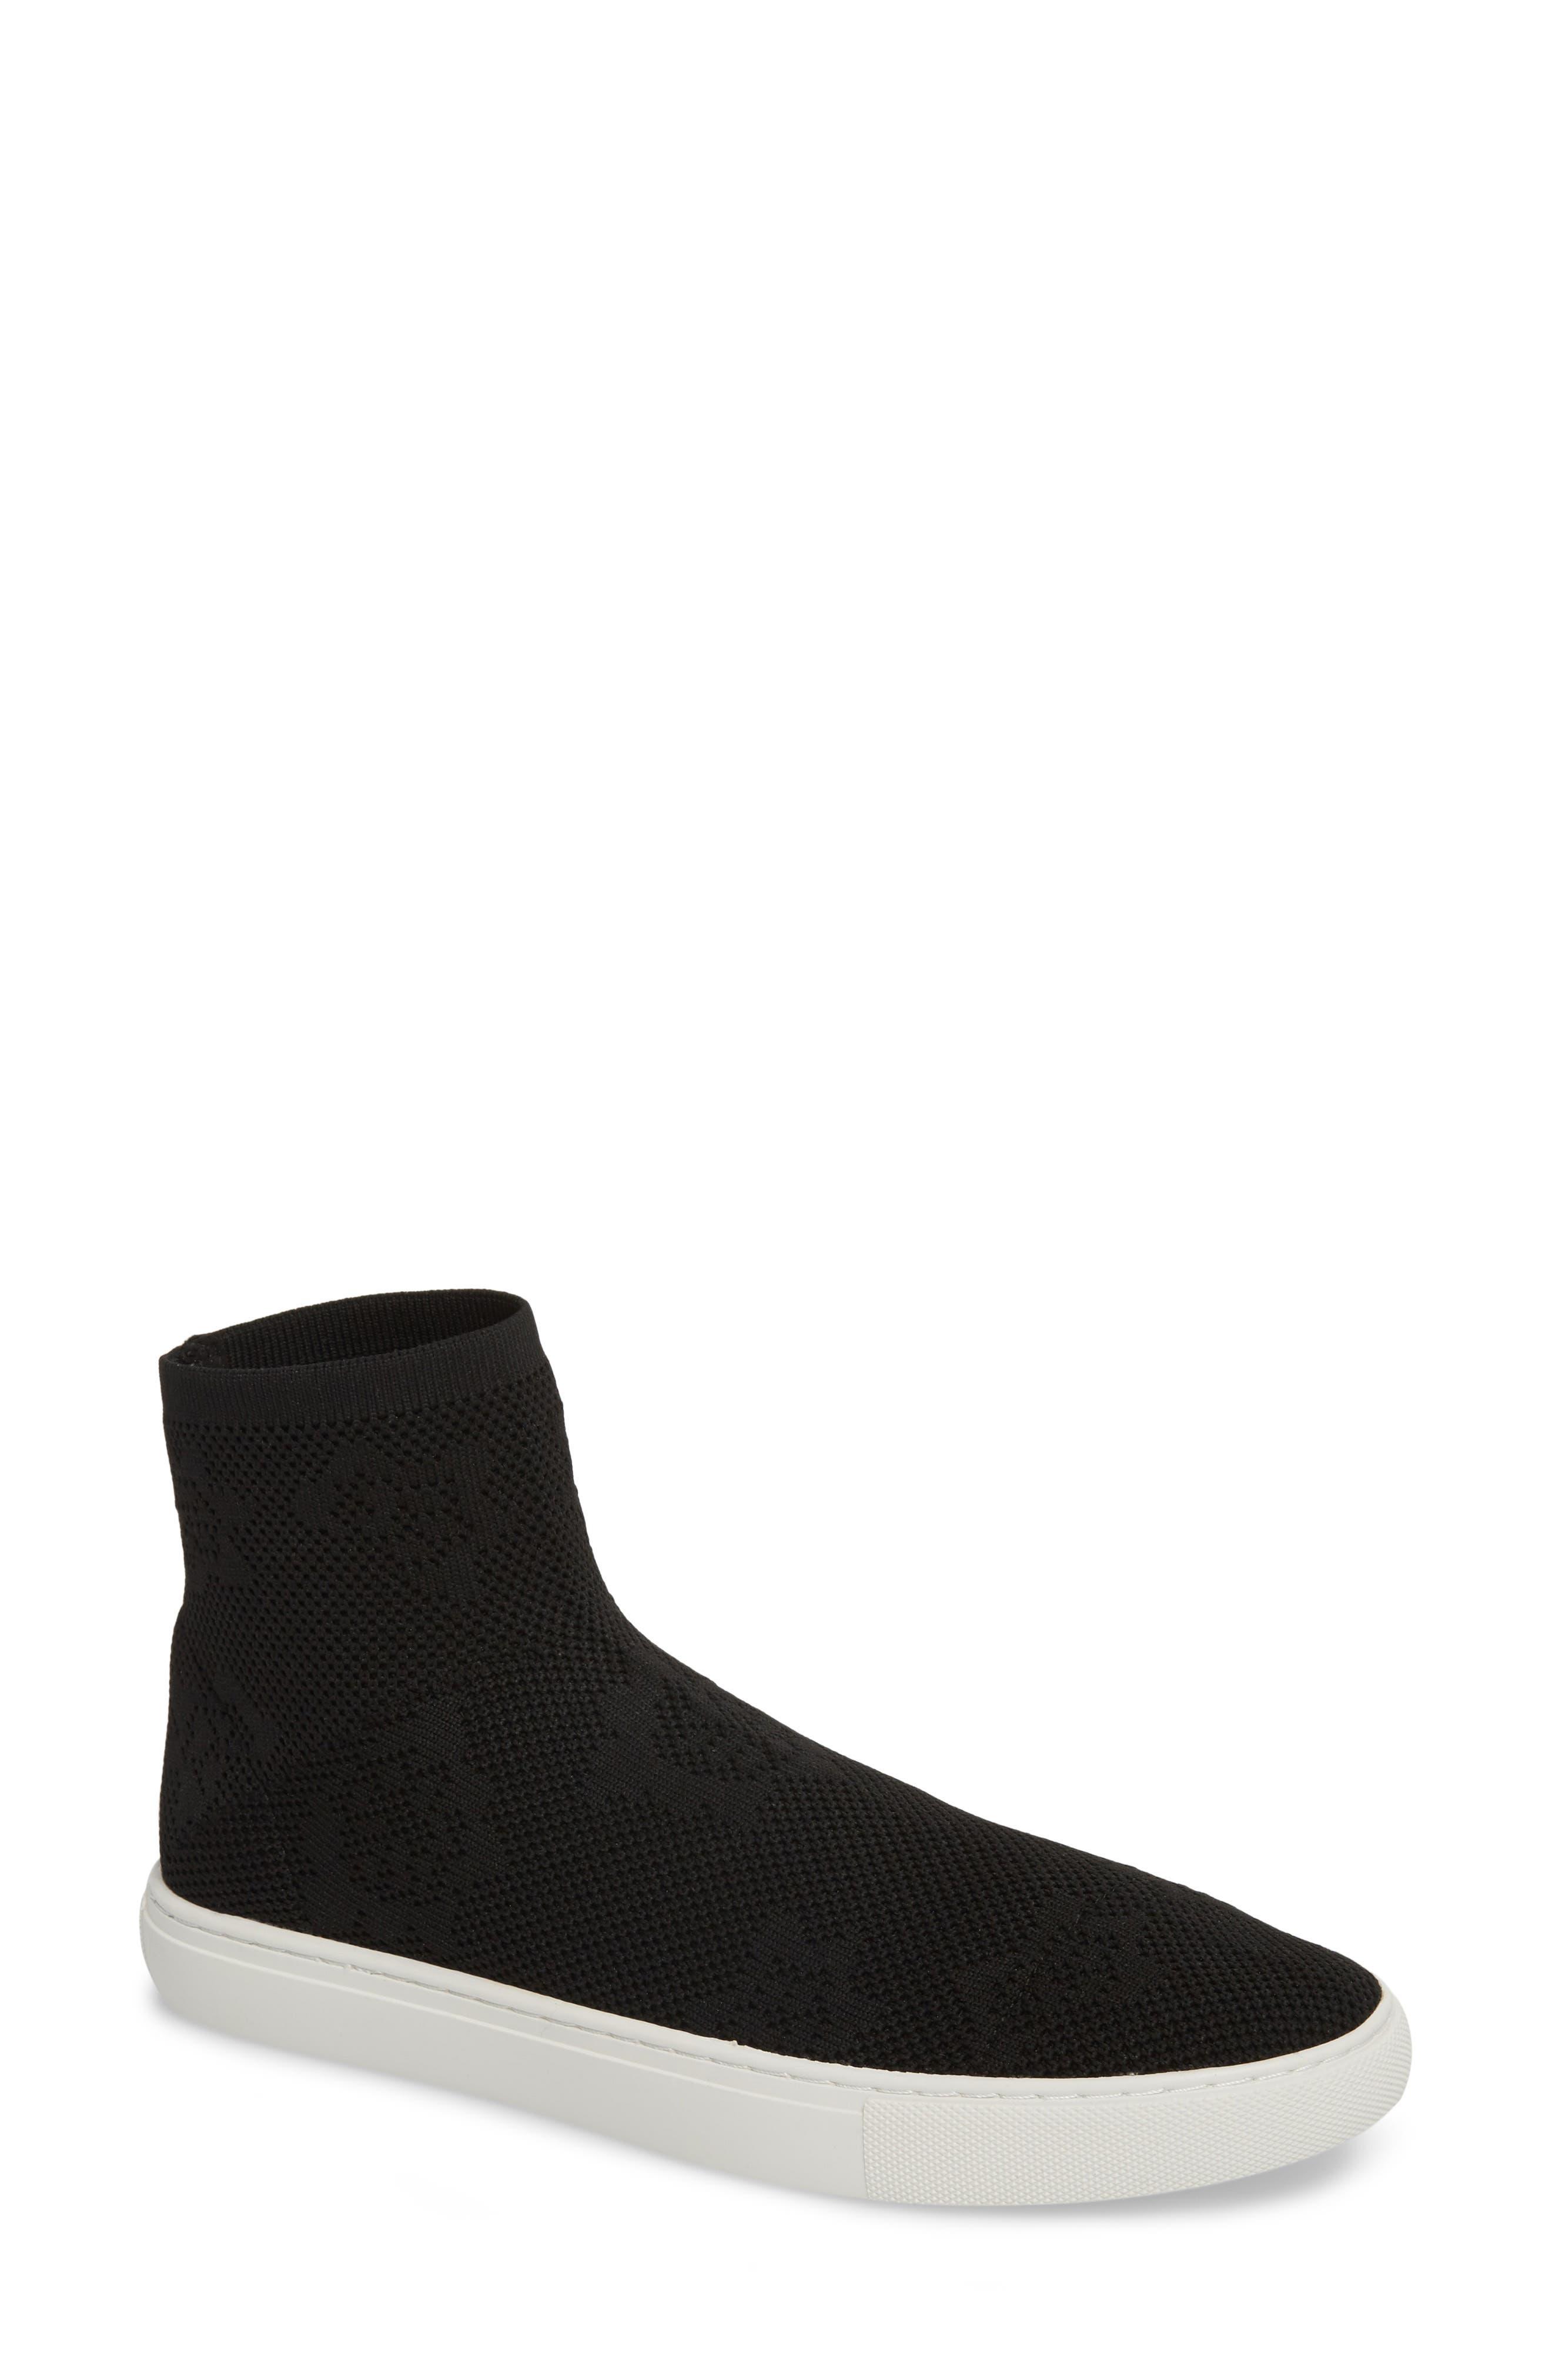 Keating Sneaker,                             Main thumbnail 1, color,                             001